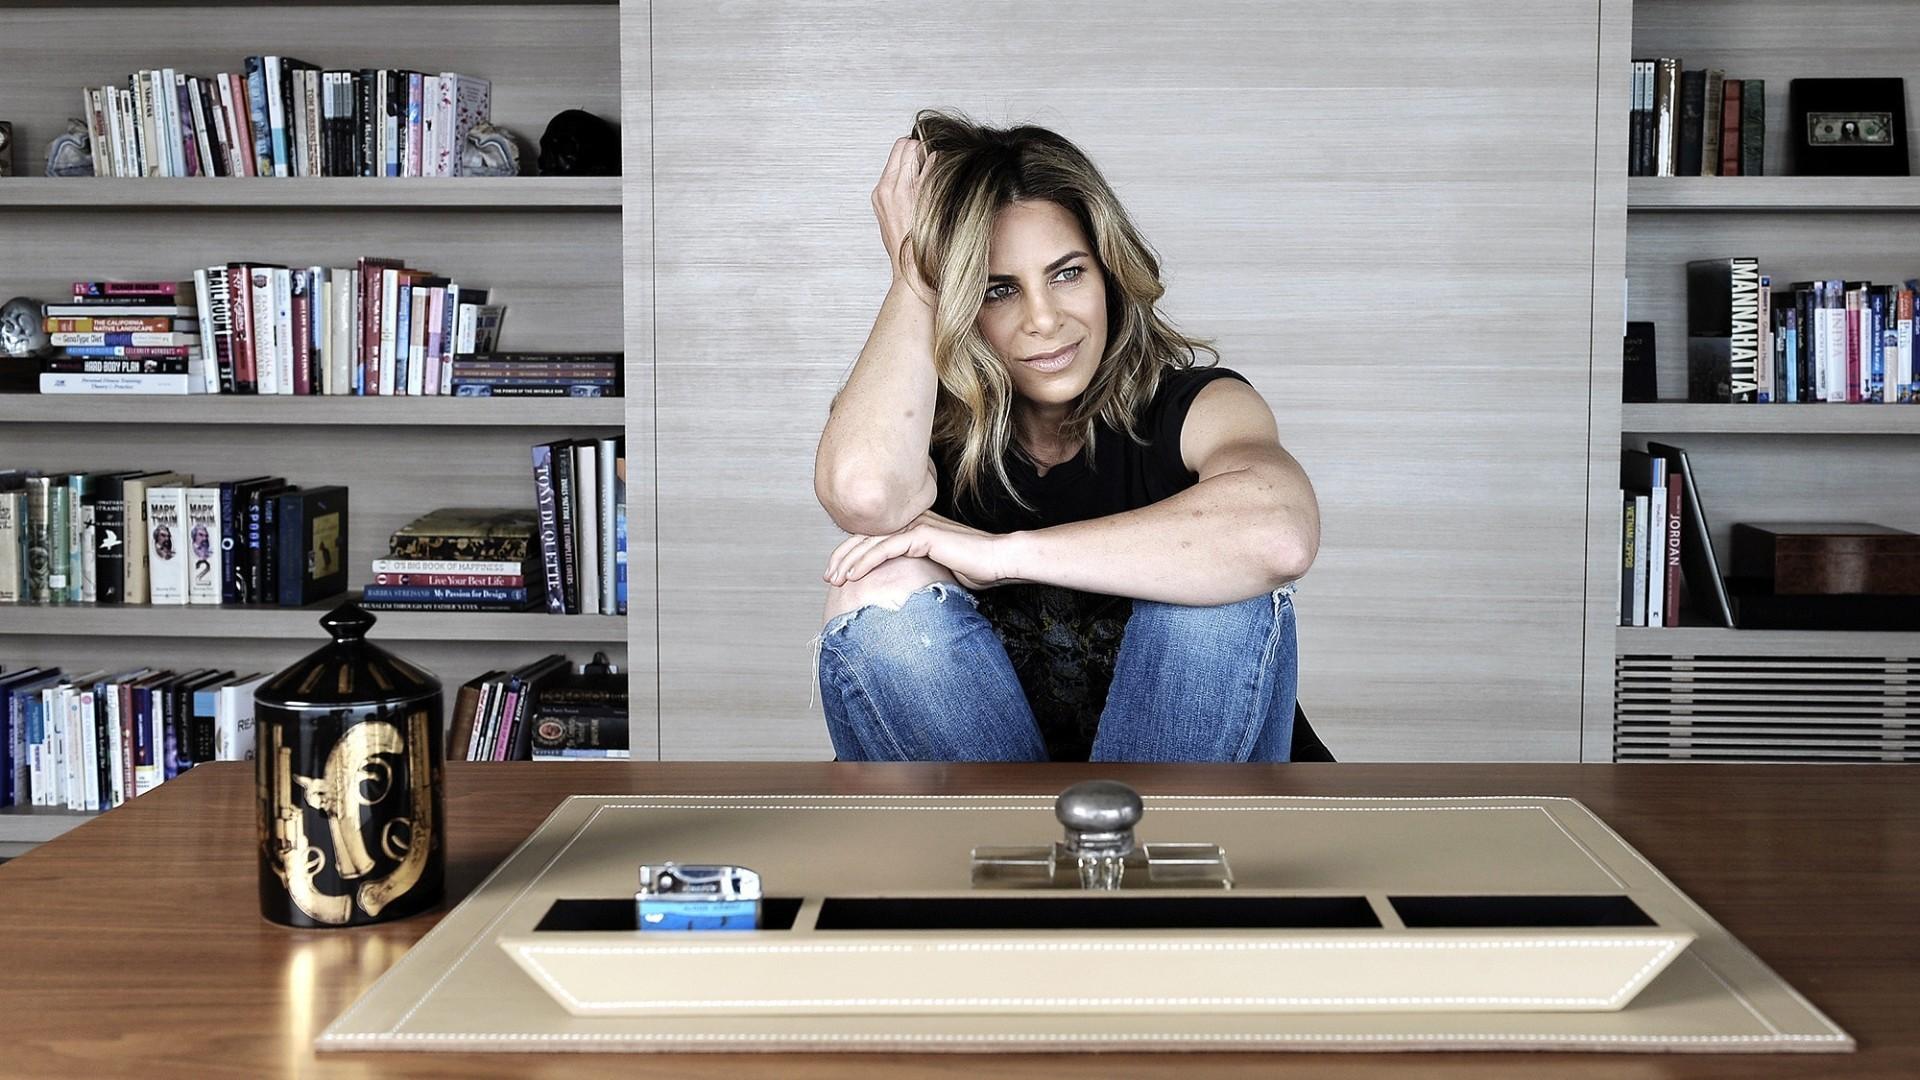 Hot Property | My Favorite Room: Jillian Michaels